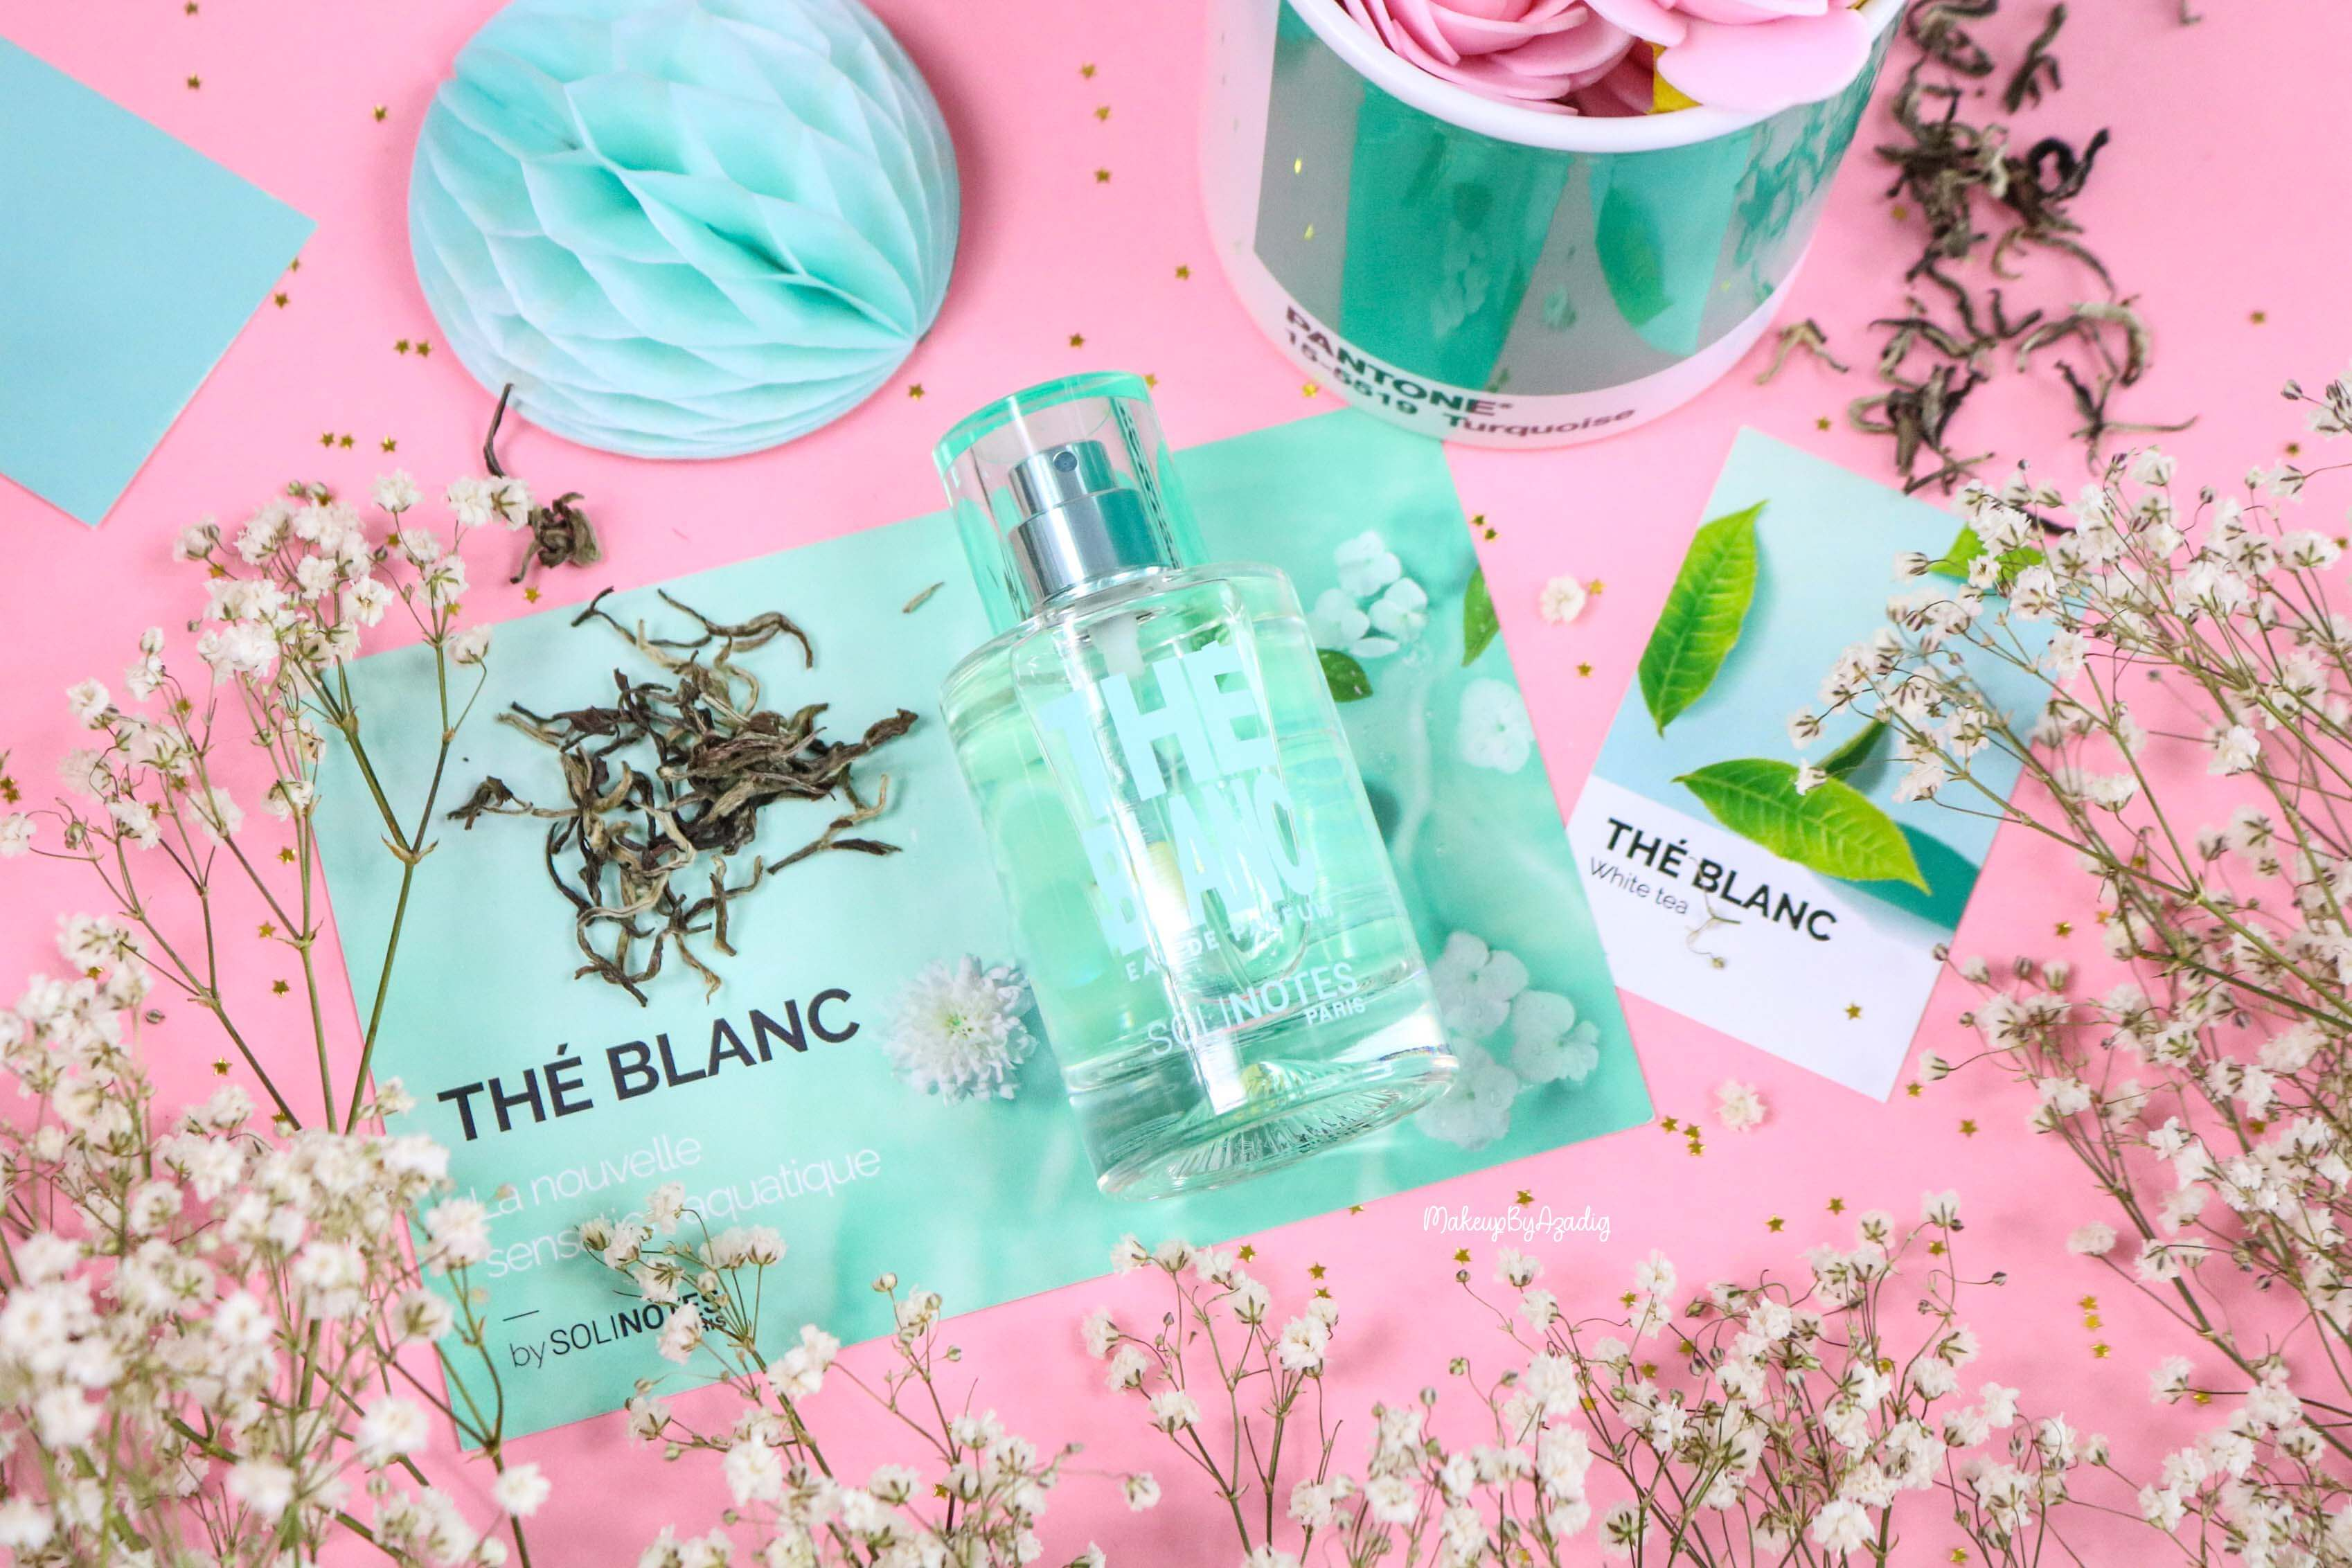 revue-parfum-solinotes-sephora-monoprix-the-blanc-vanille-oranger-prix-pas-cher-promo-makeupbyazadig-miniature